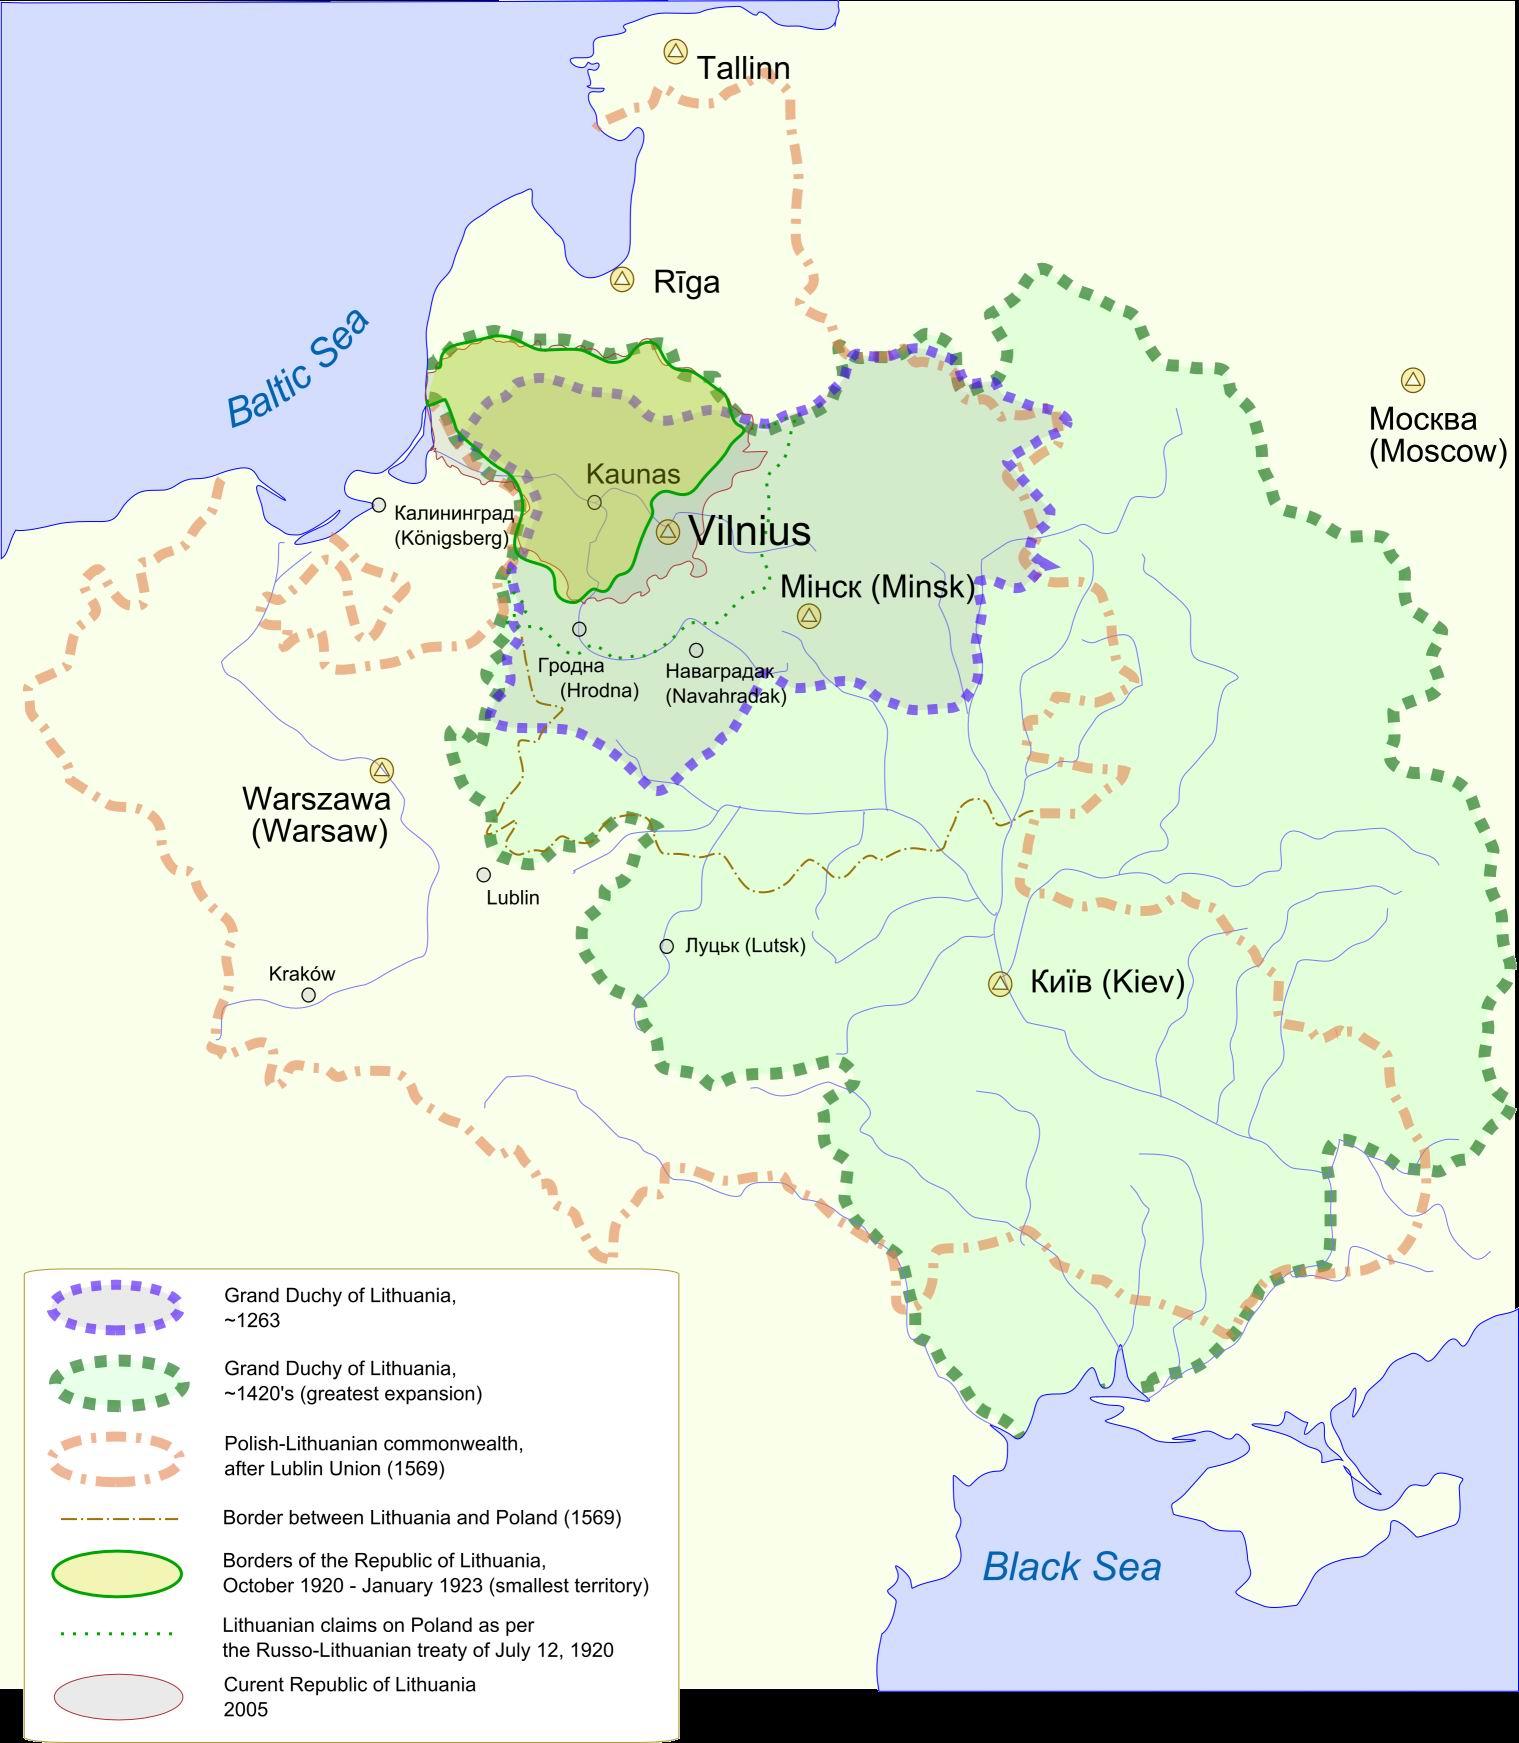 http://zenius.kalnieciai.lt/europe/lithuania/maps/1263-.jpg